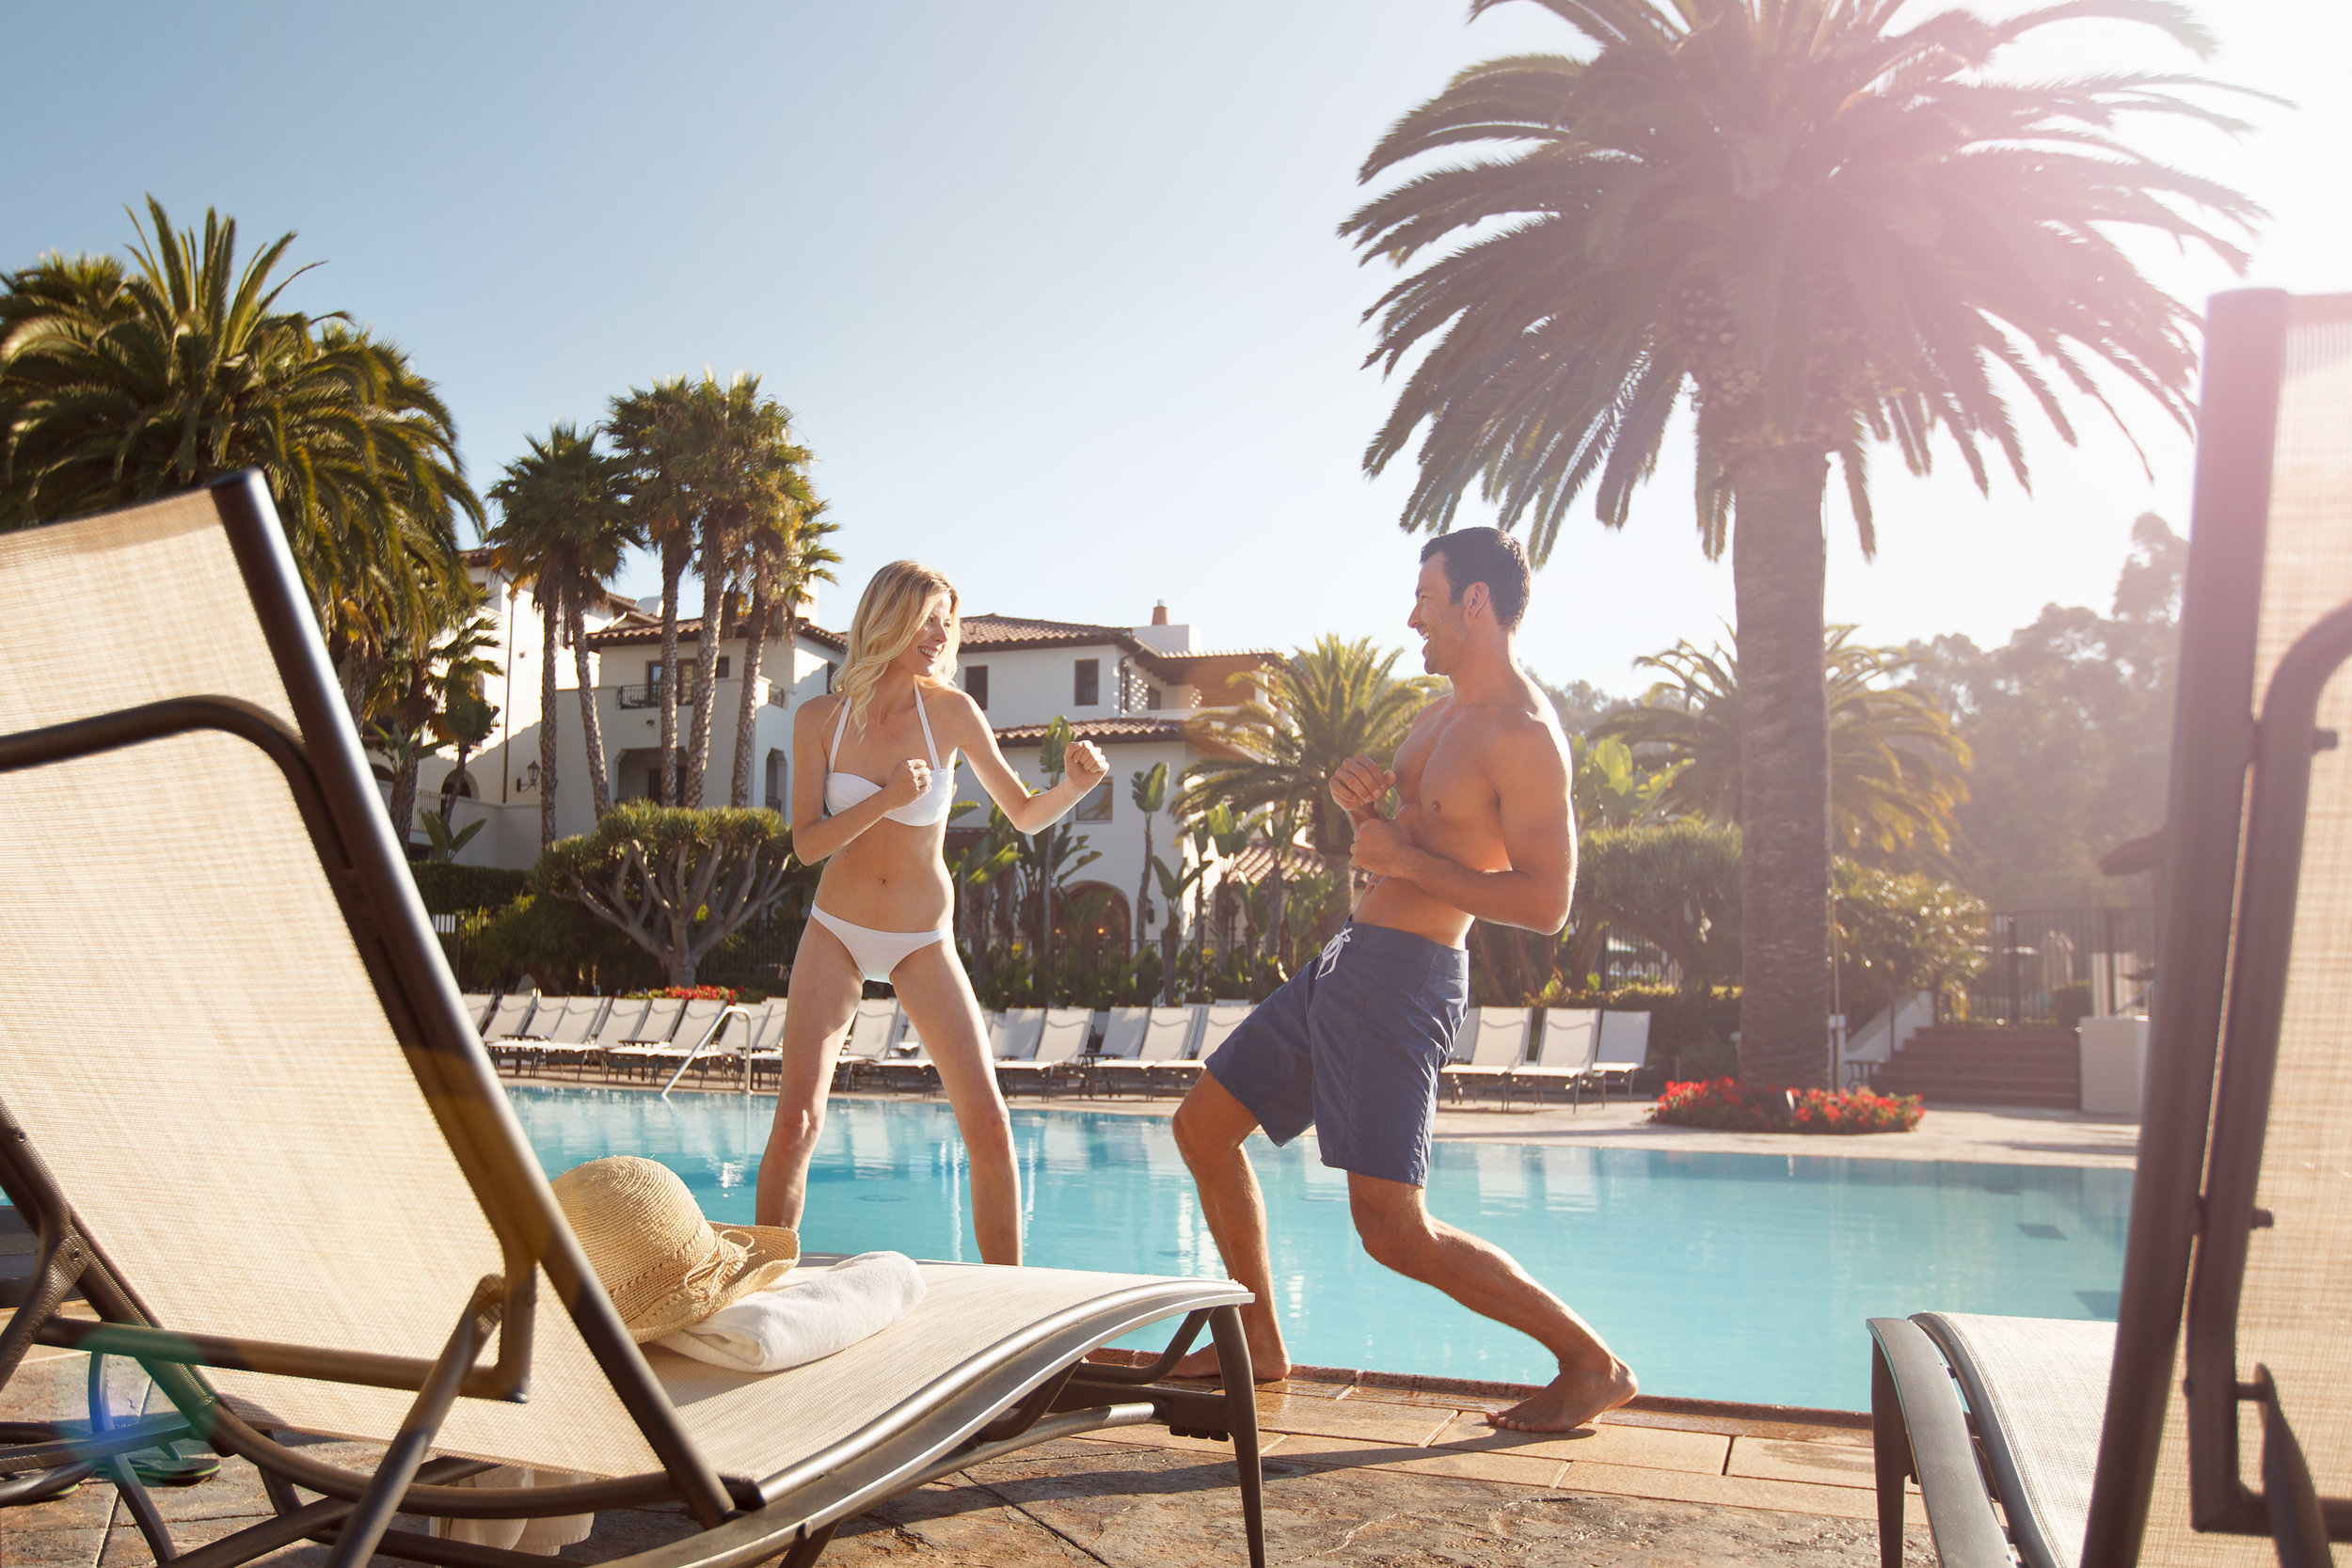 Lifestyle-007-luxury-resort-pool-couple.jpg